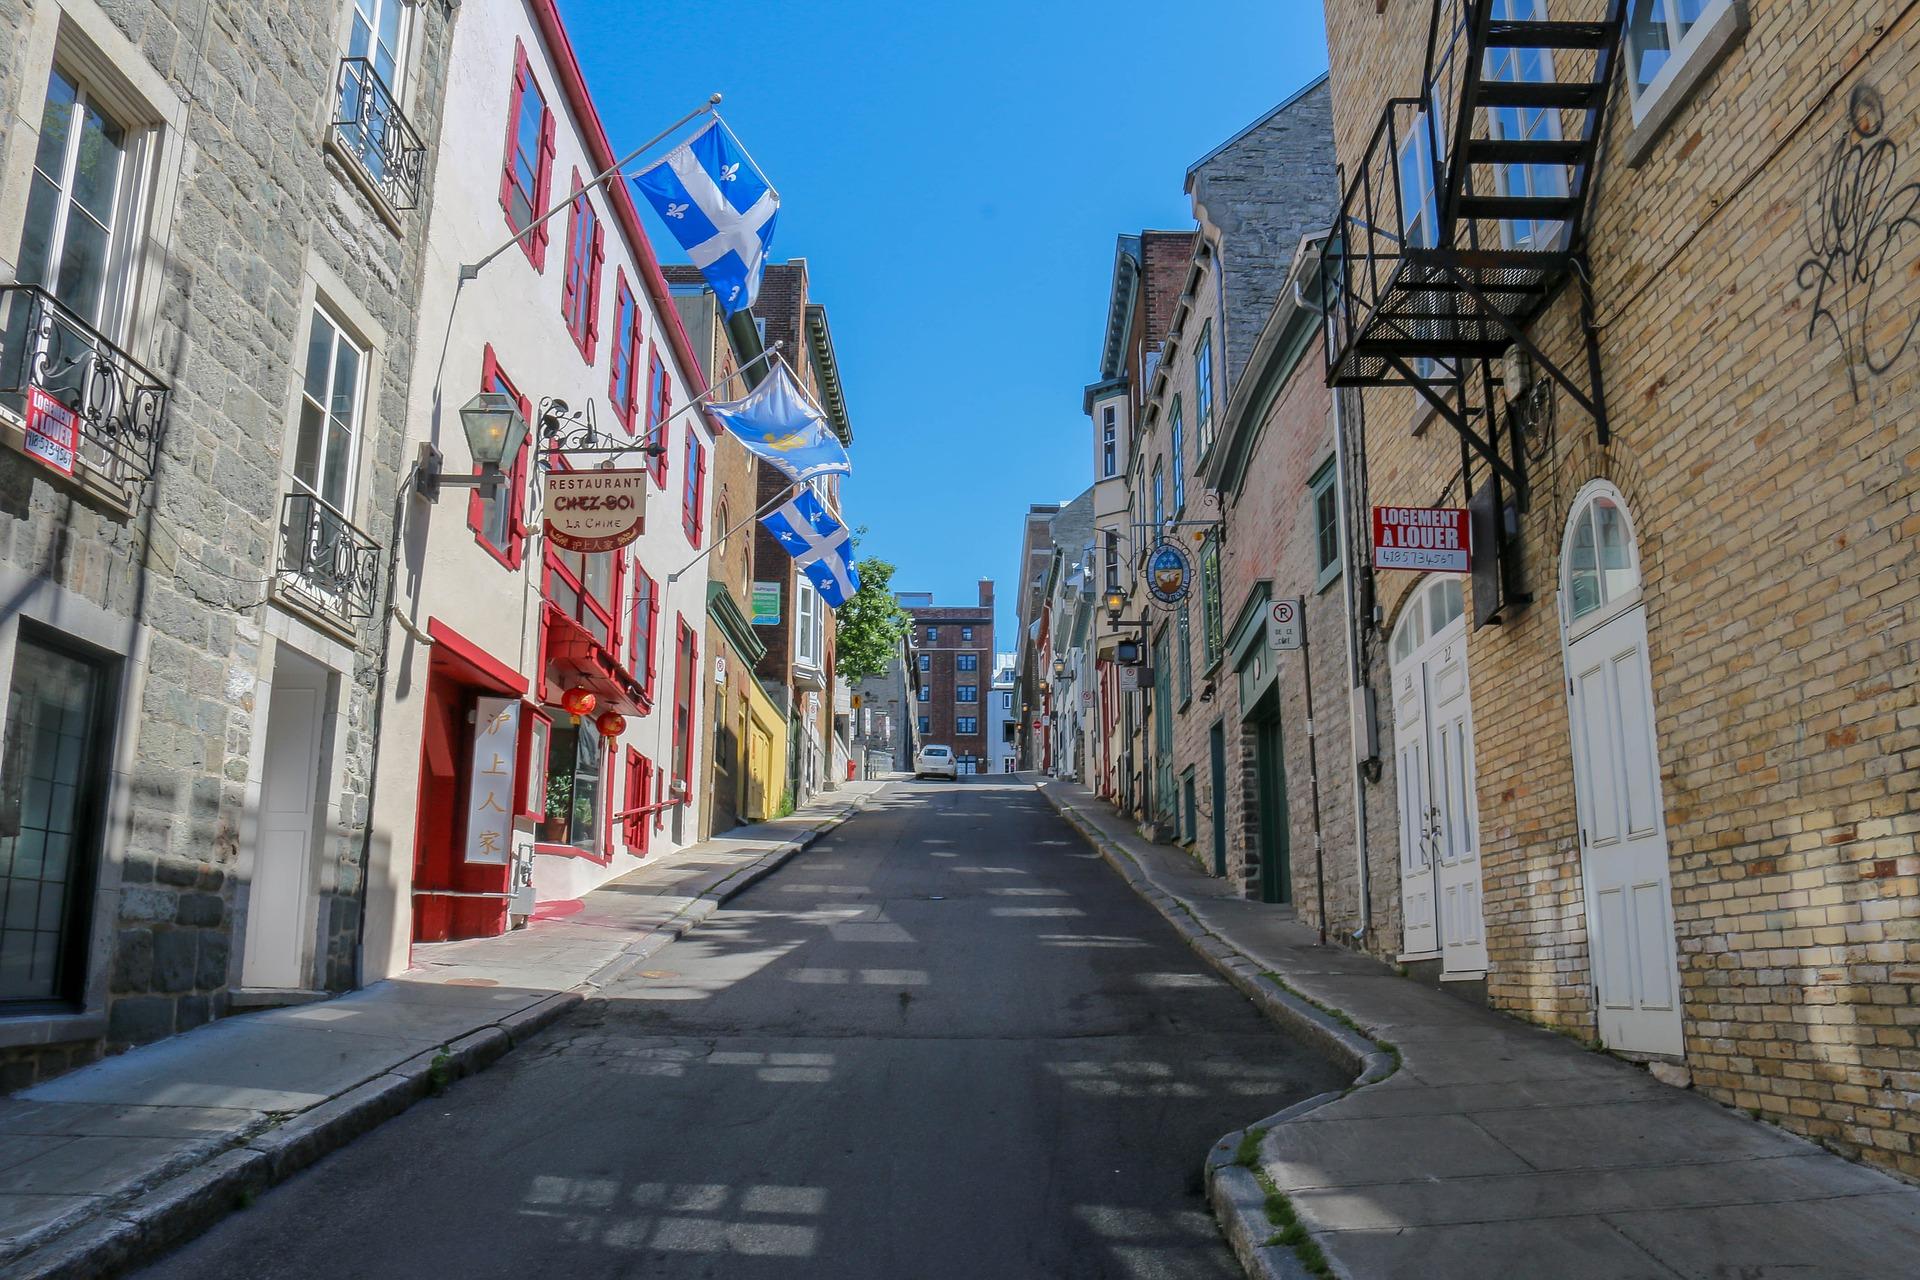 narrow street in upper town quebec city